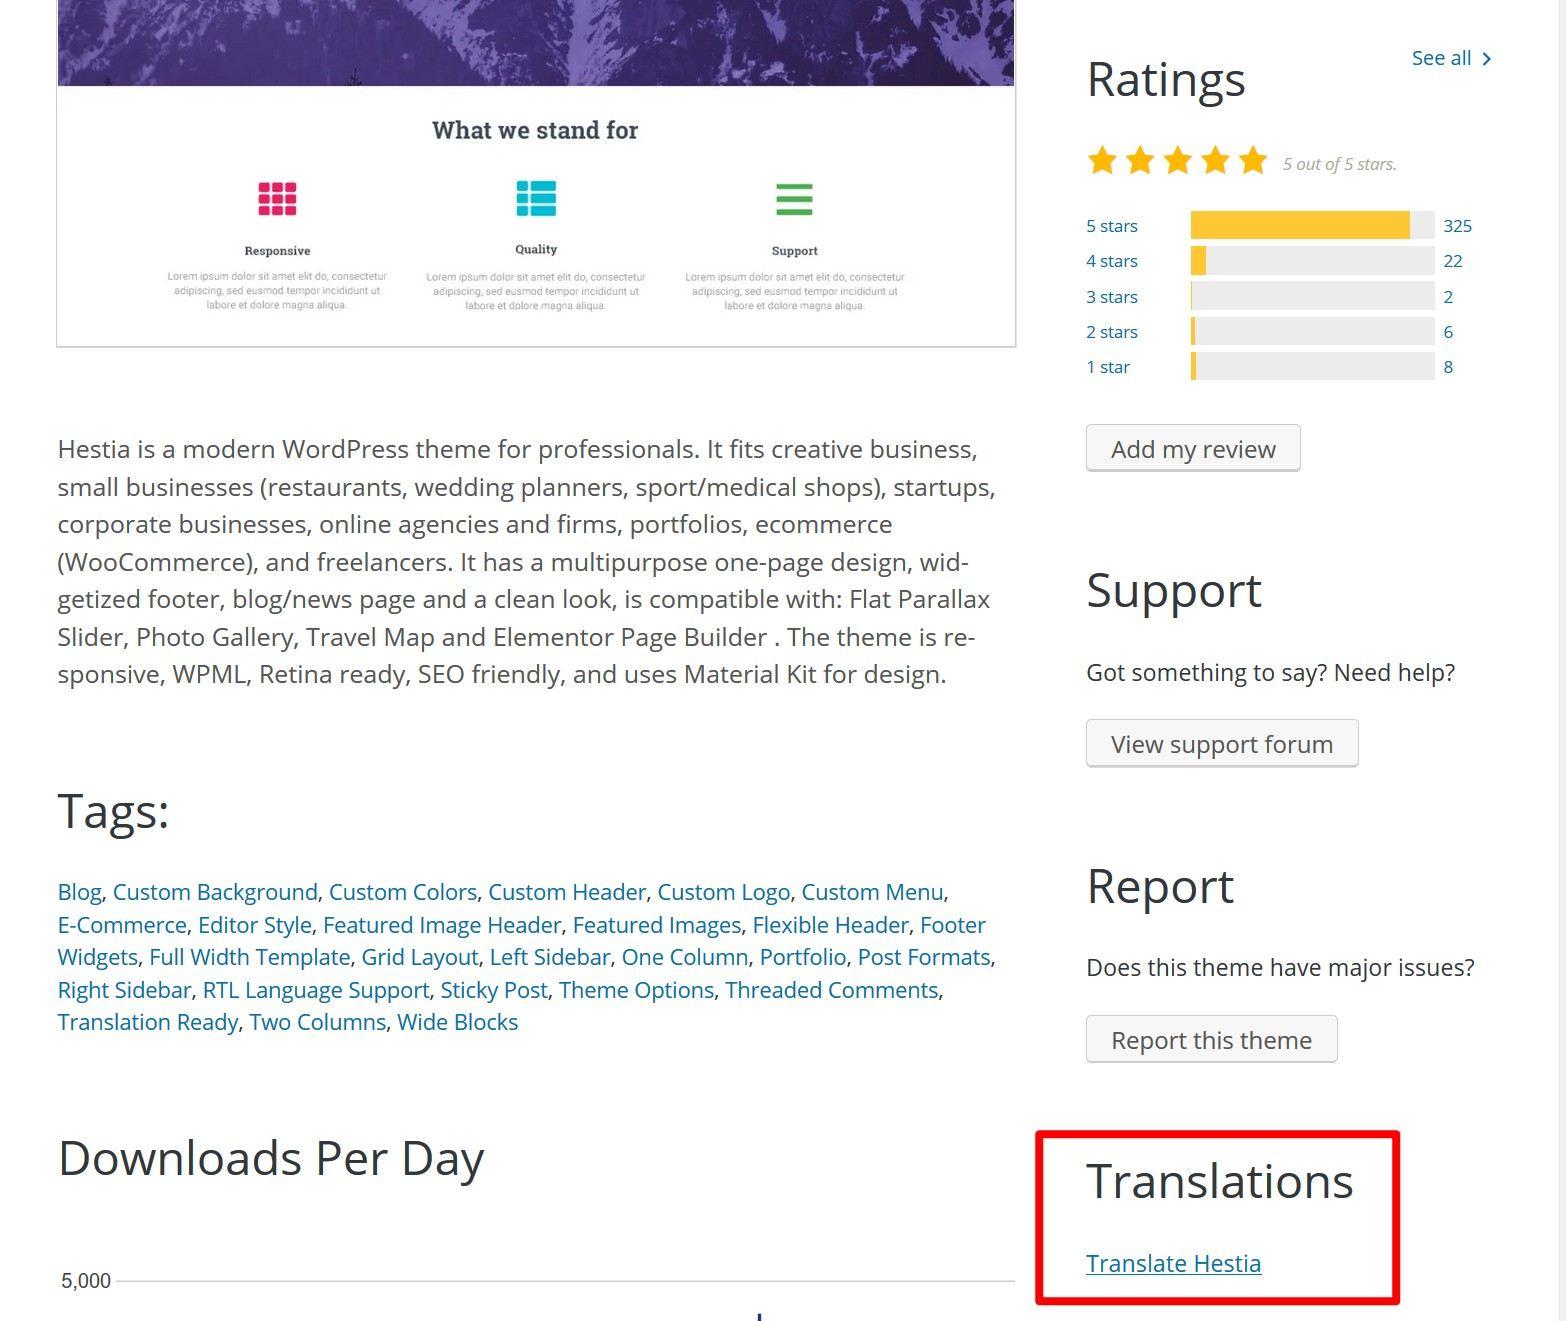 Access translations list